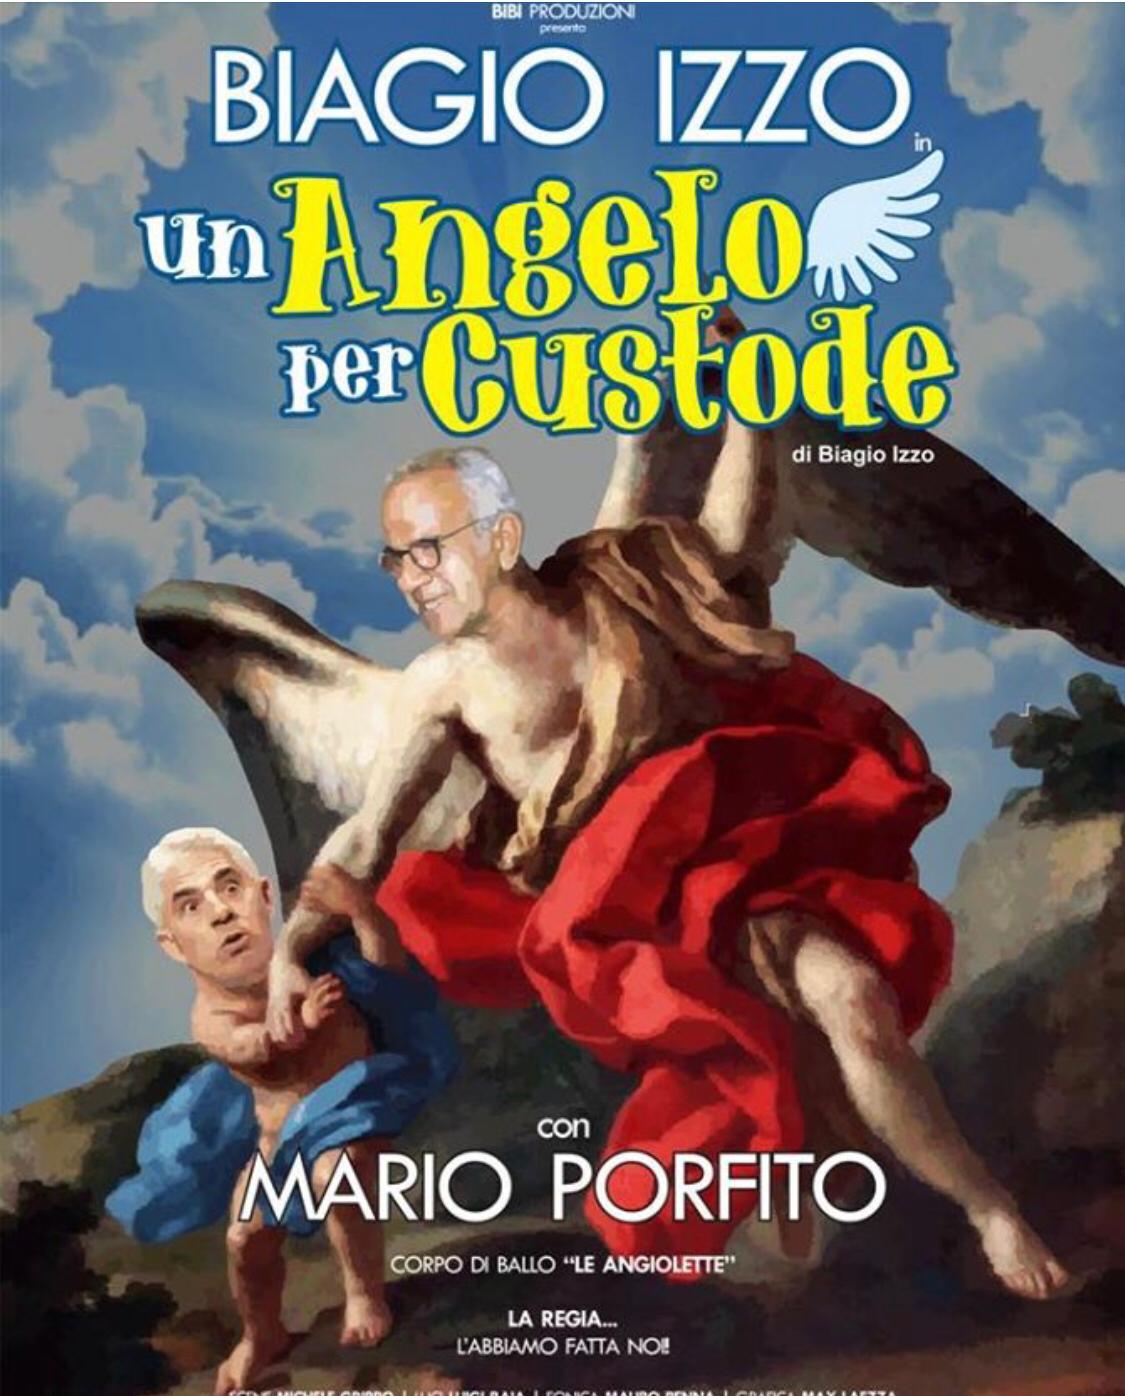 BIAGIO IZZO in UN ANGELO PER CUSTODE